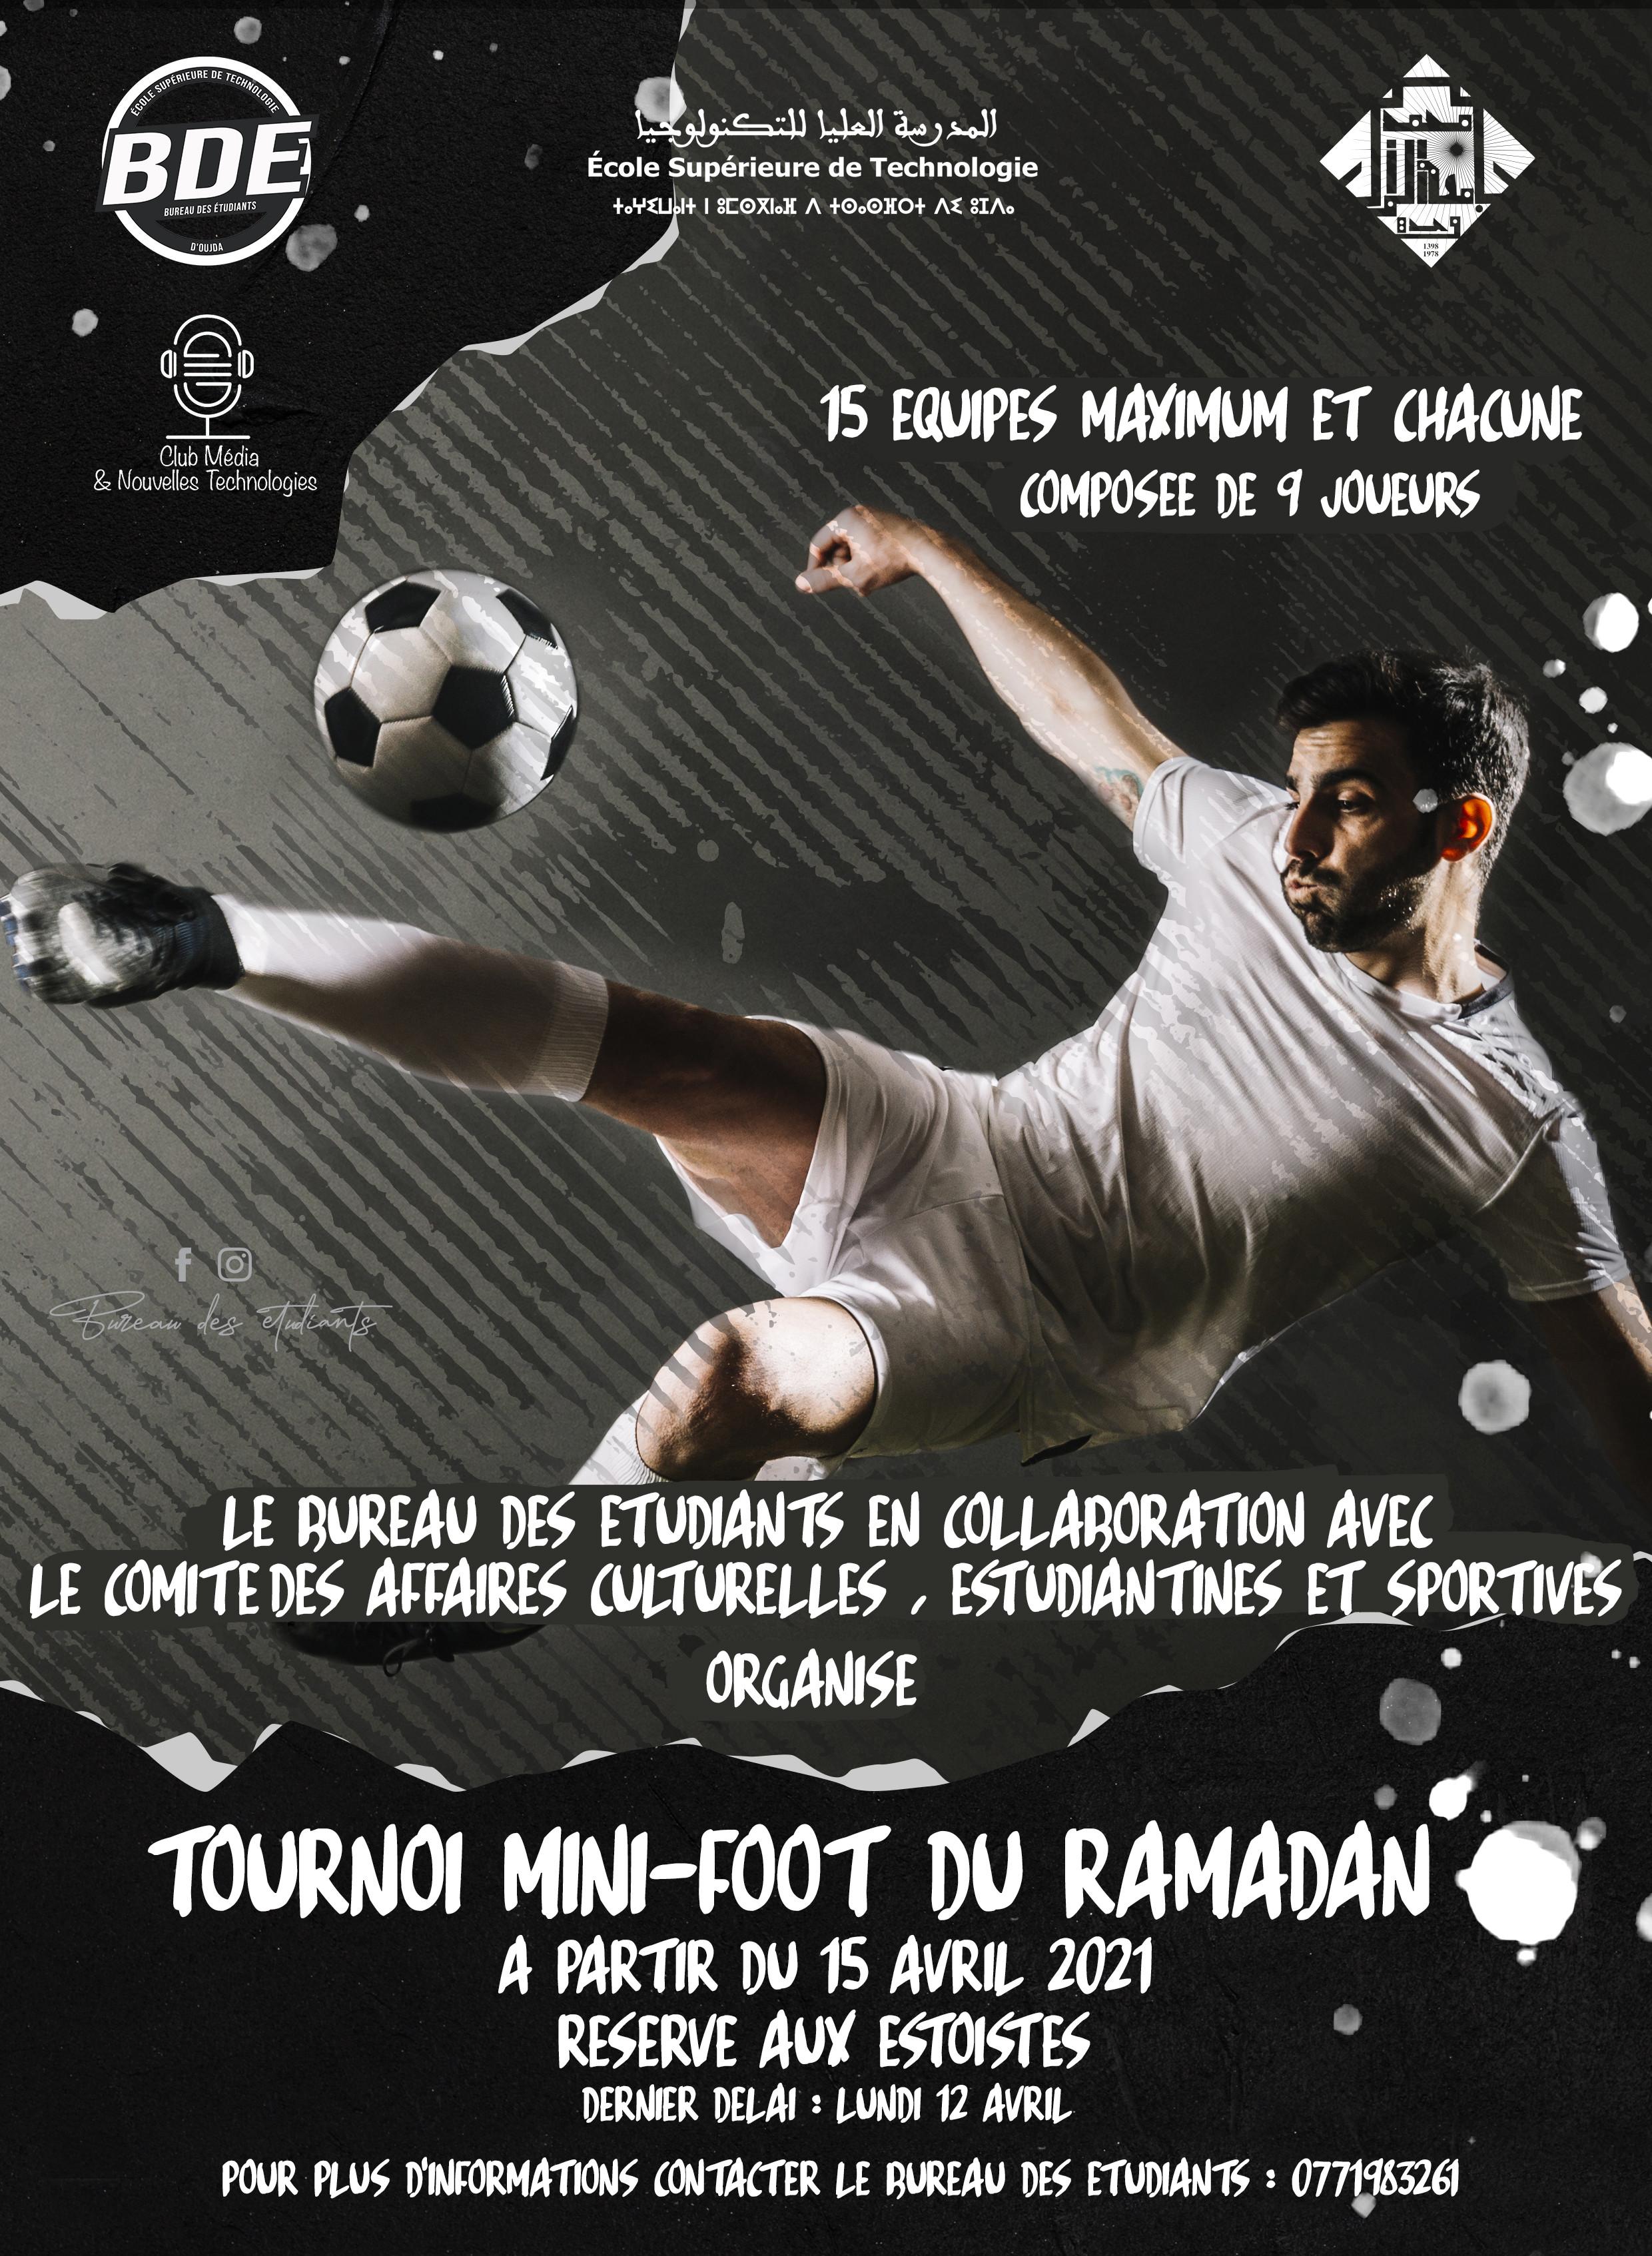 Tournoi mini-foot du RAMADAN 1442